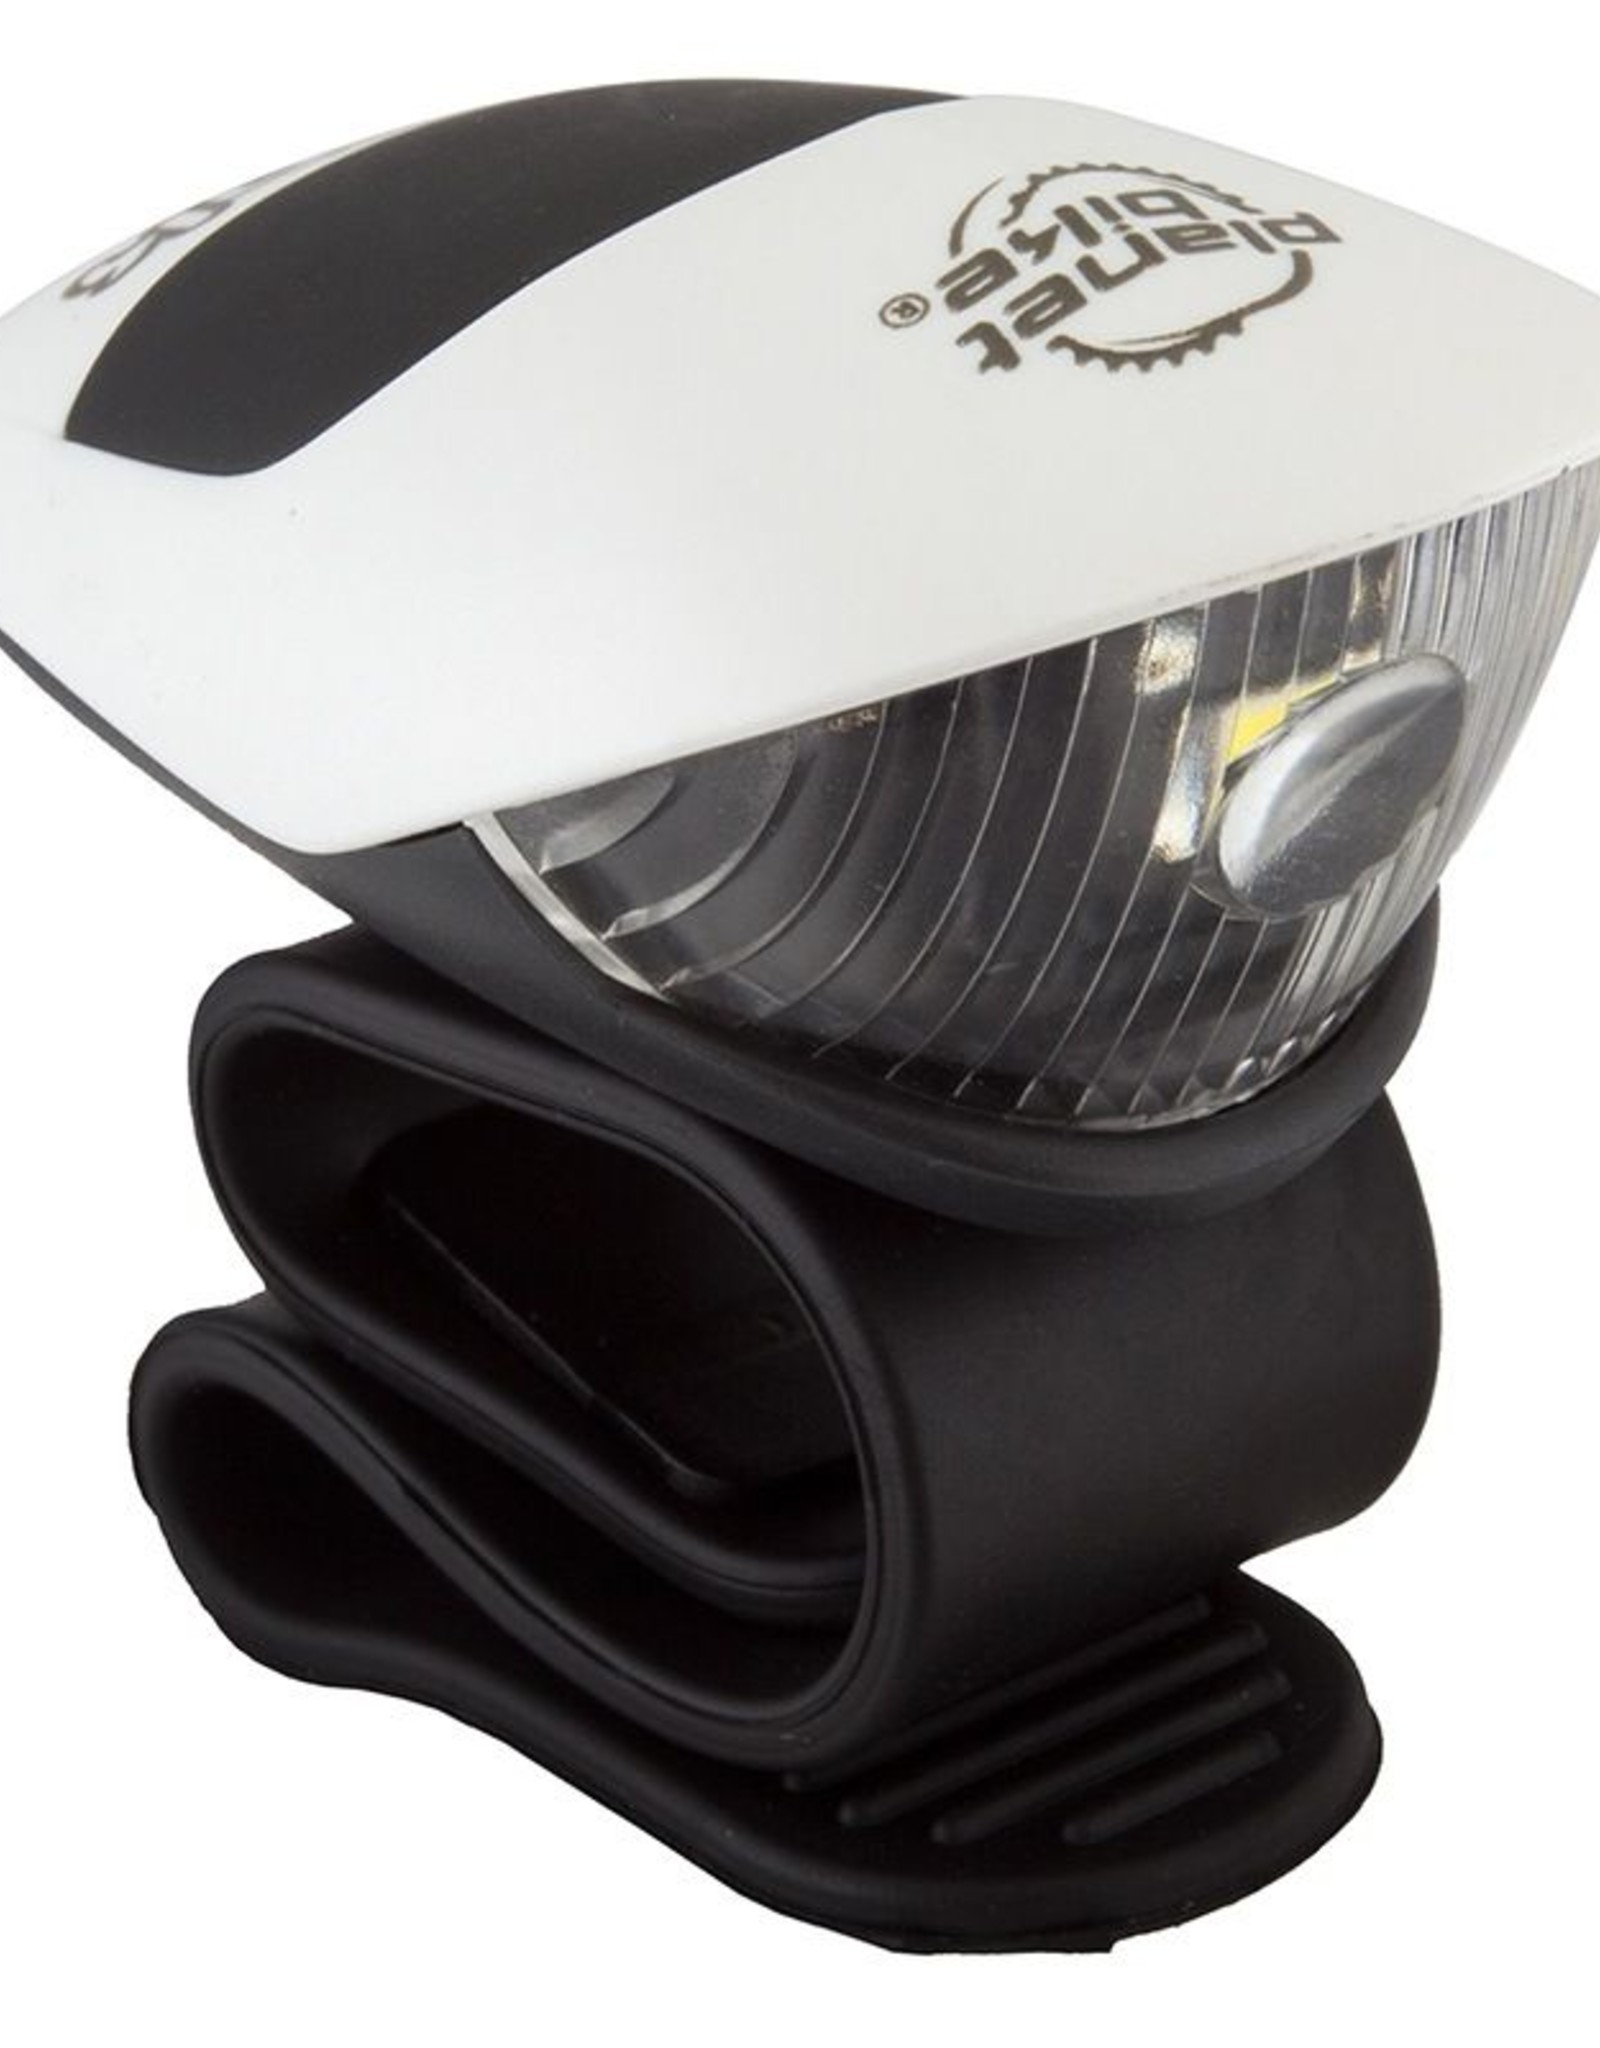 Planet Bike Planet Bike Spok LED Micro Headlight